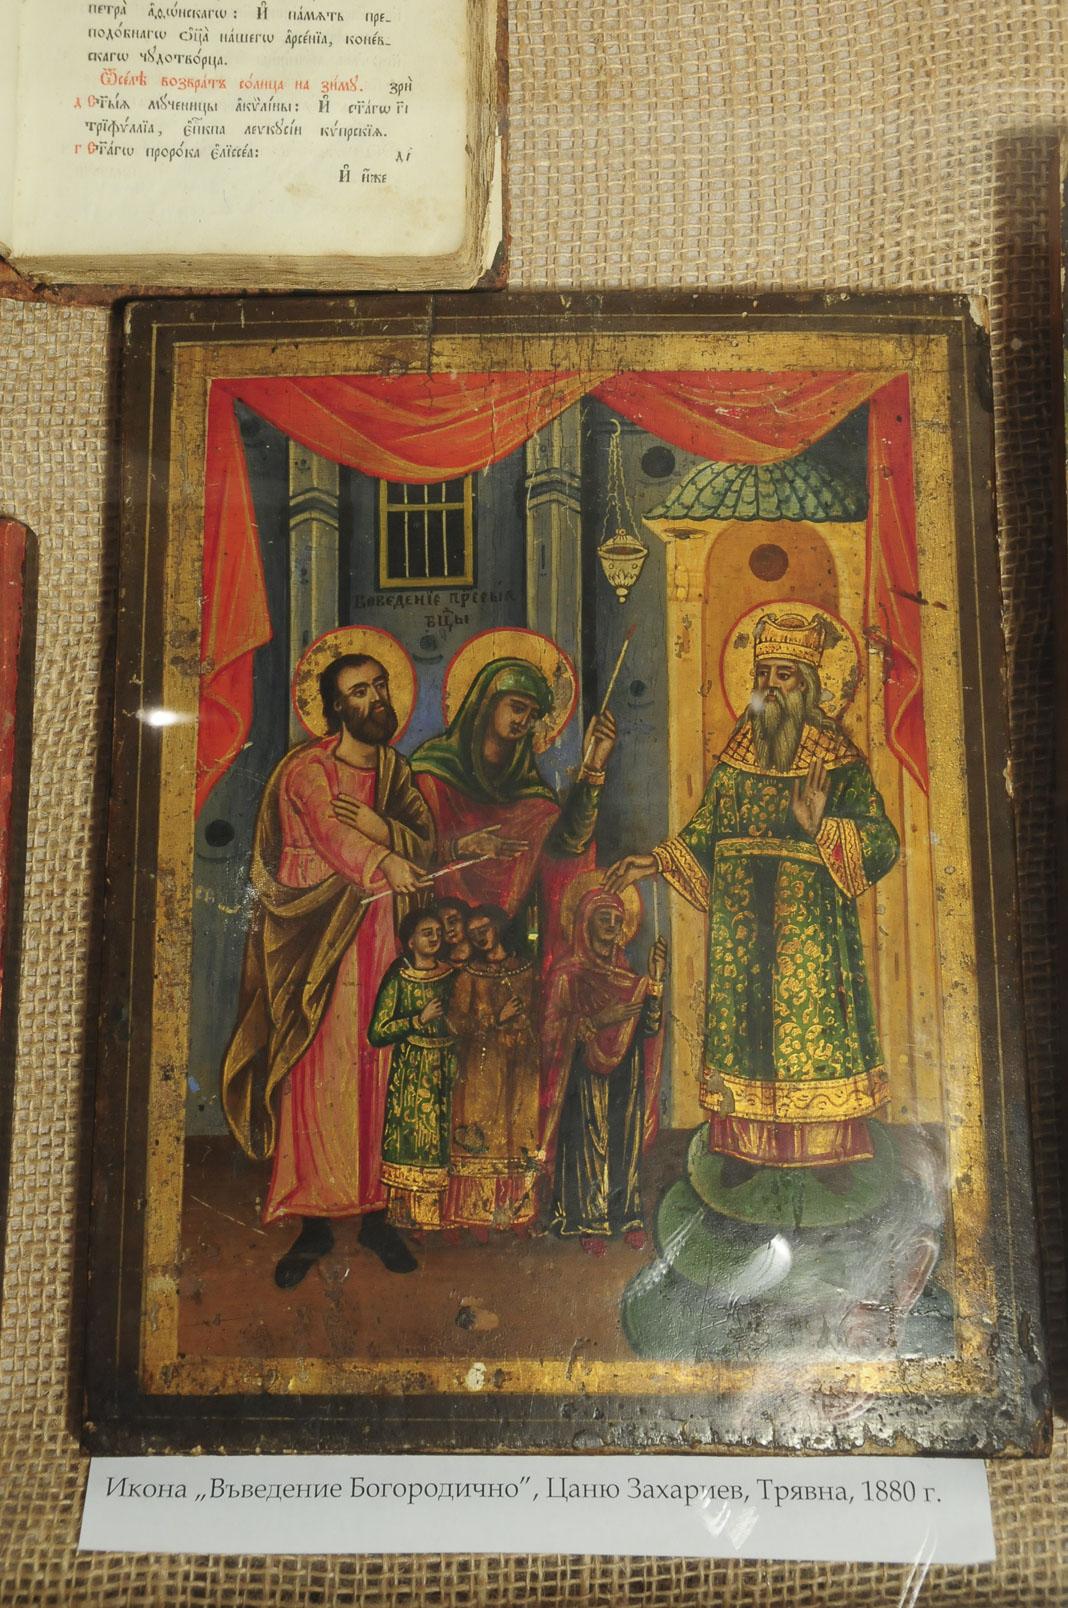 troyan-museum-180-godini-hram-cveta-paraskeva-5